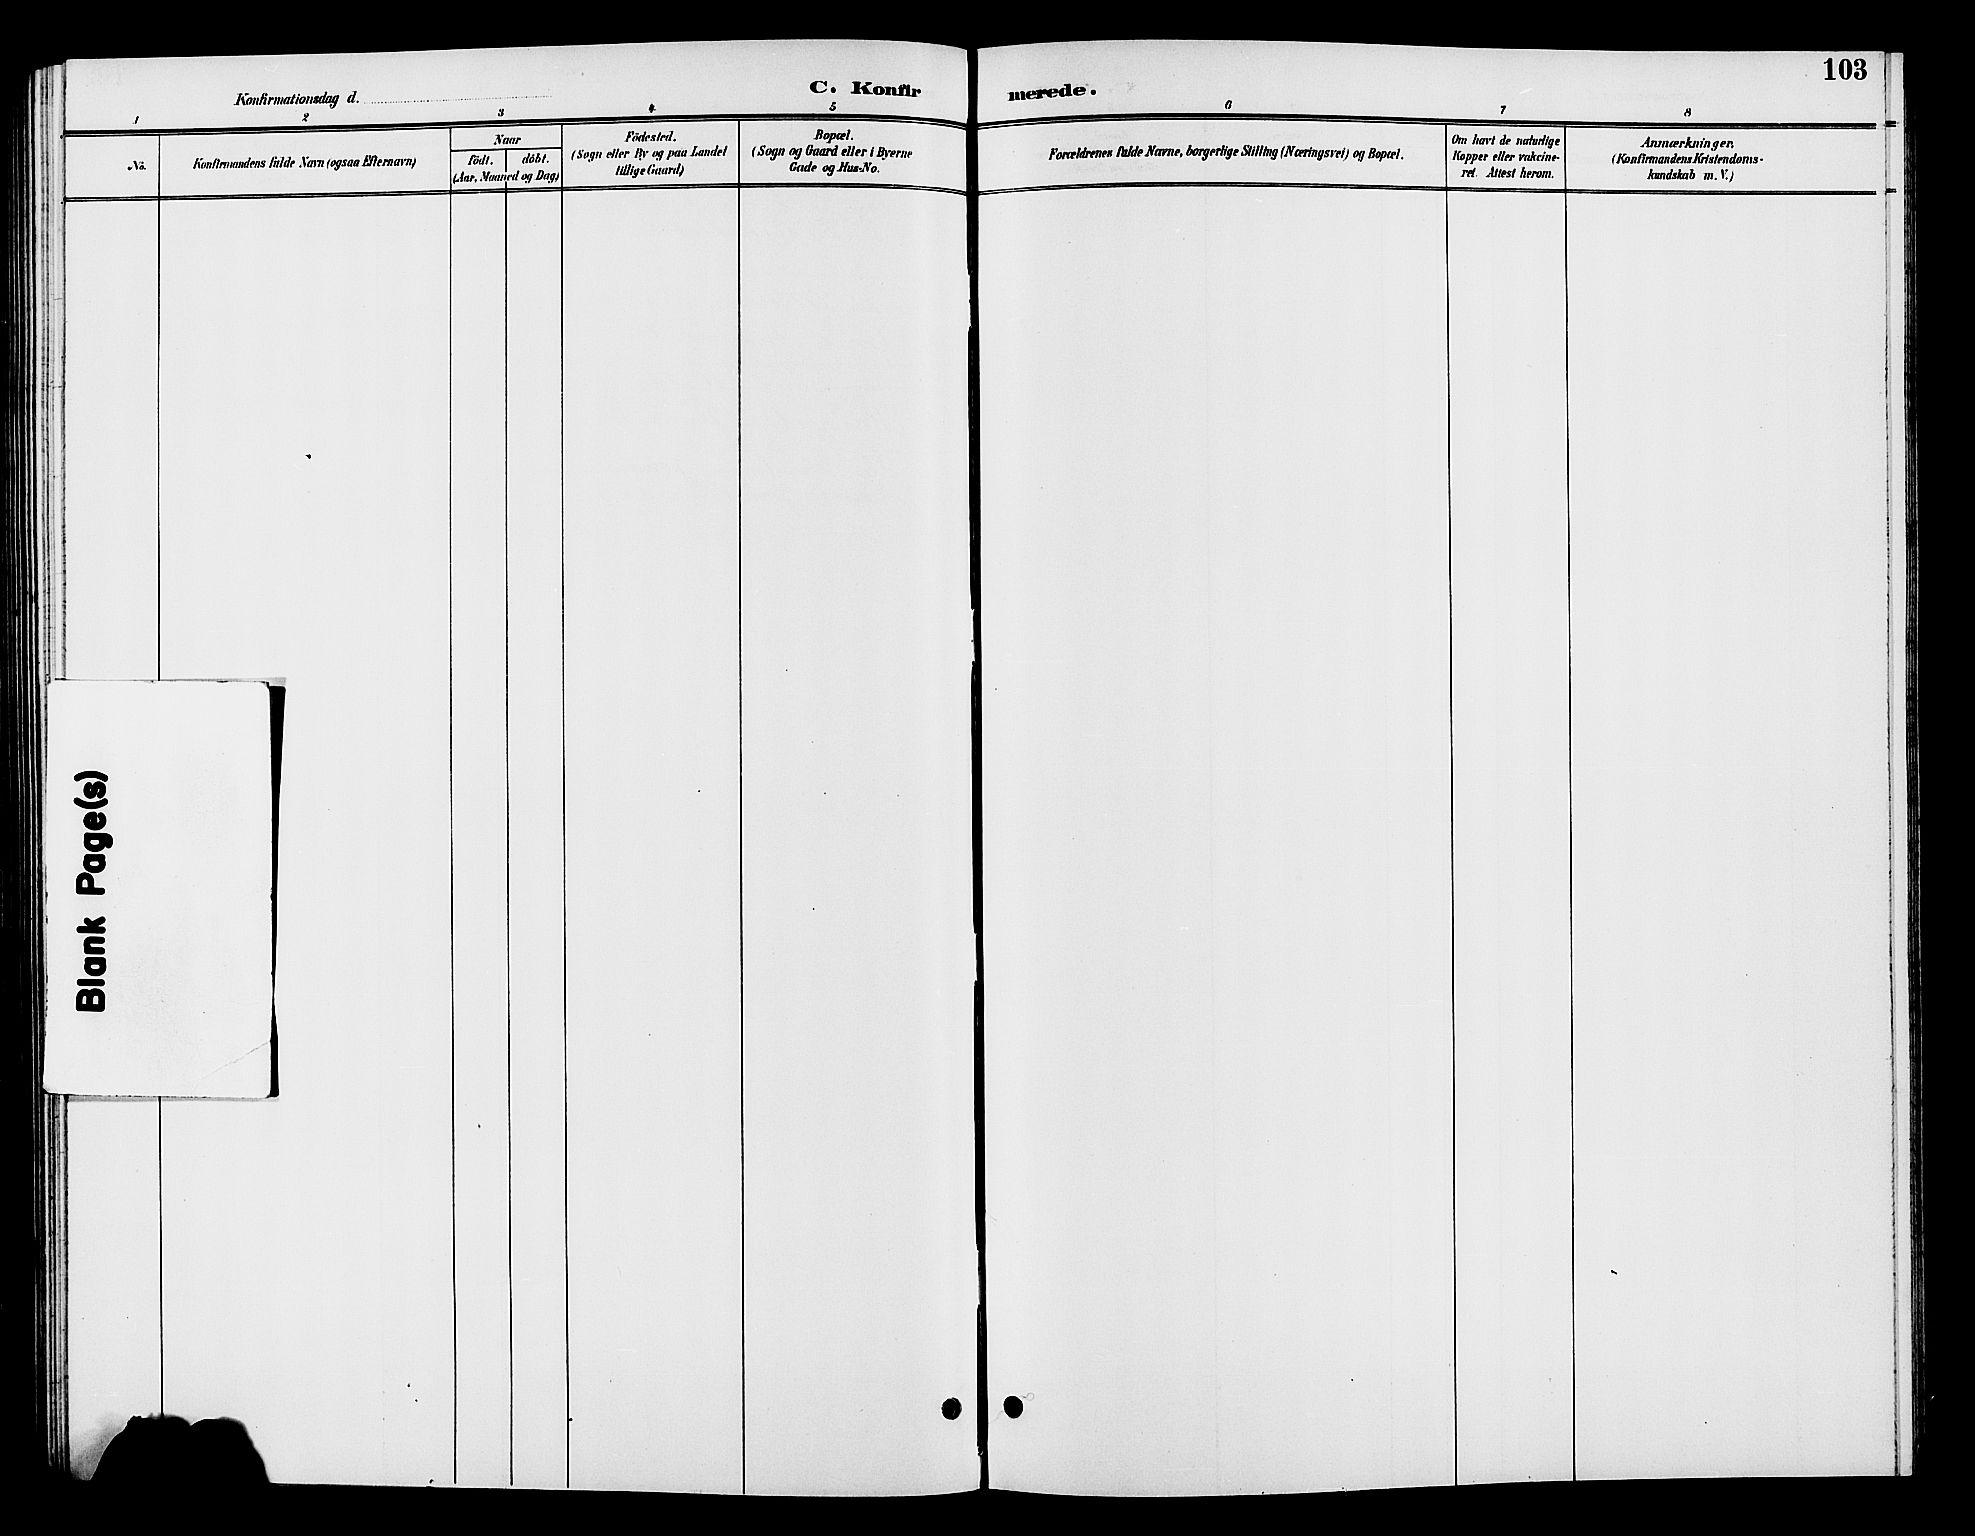 SAH, Vardal prestekontor, H/Ha/Hab/L0009: Klokkerbok nr. 9, 1894-1902, s. 103